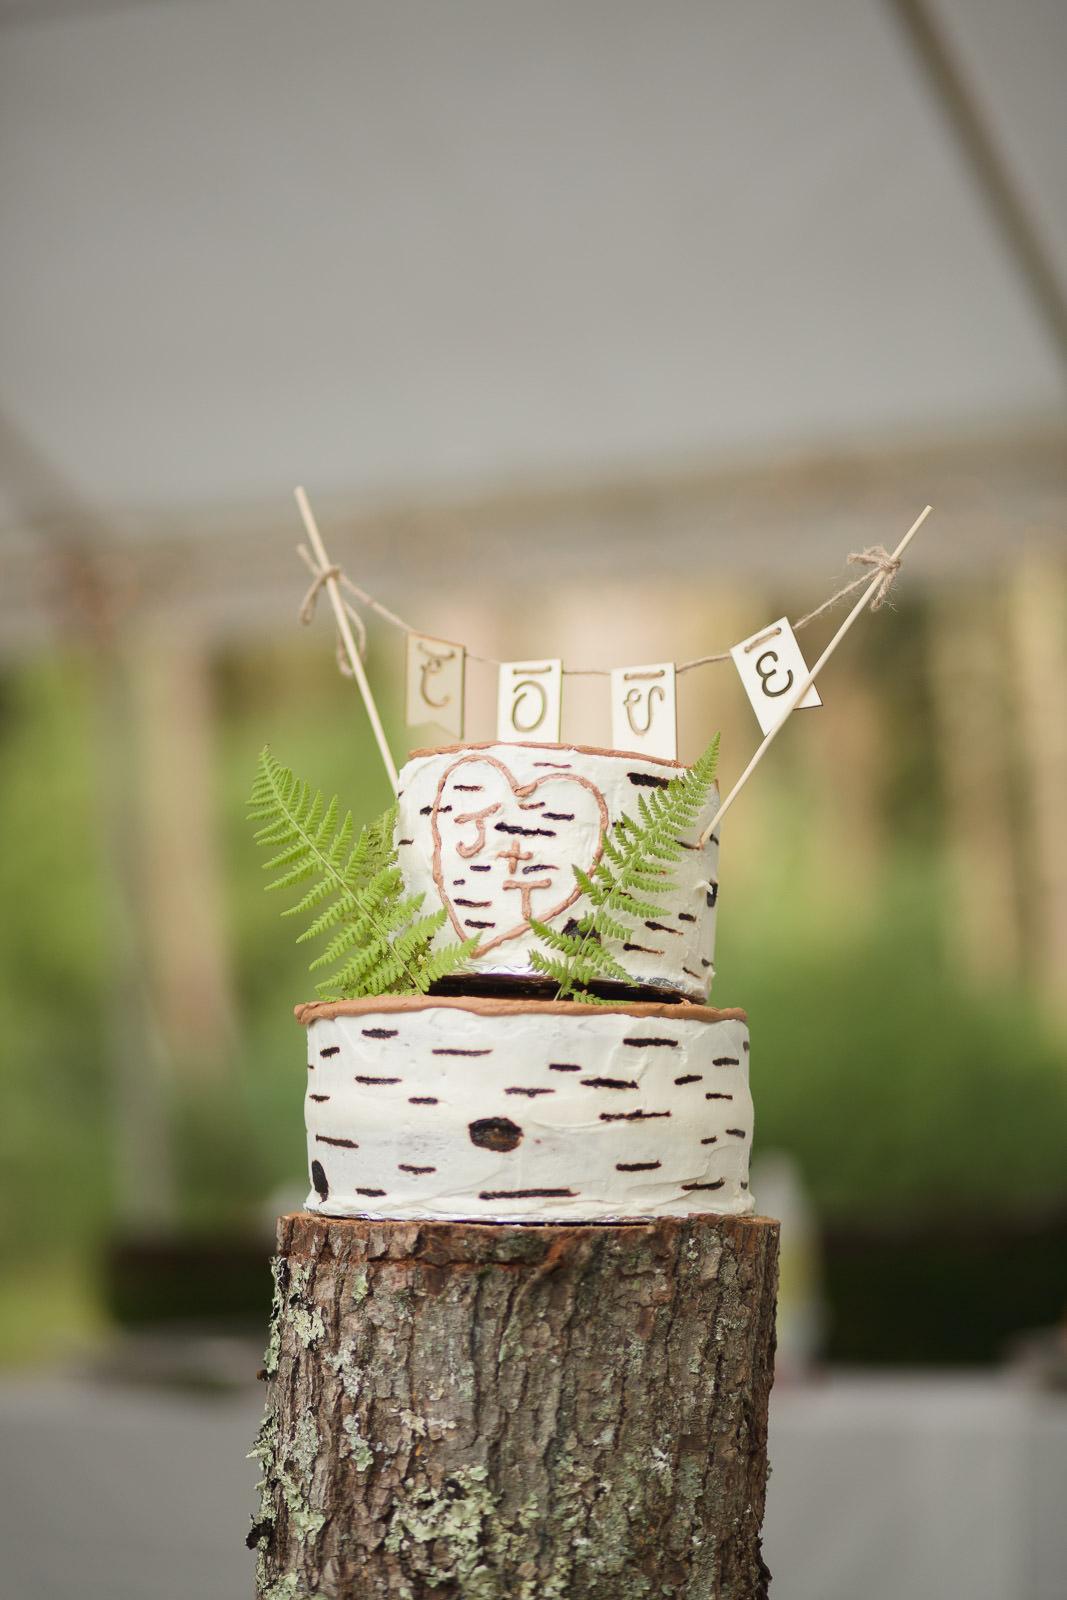 Coventry, Rhode Island, RI, Backyard Wedding, forest, earthy, wedding, tracy jenkins photography, wedding photographer, ri wedding photographer, Rhode Island Wedding photographer, wedding cake